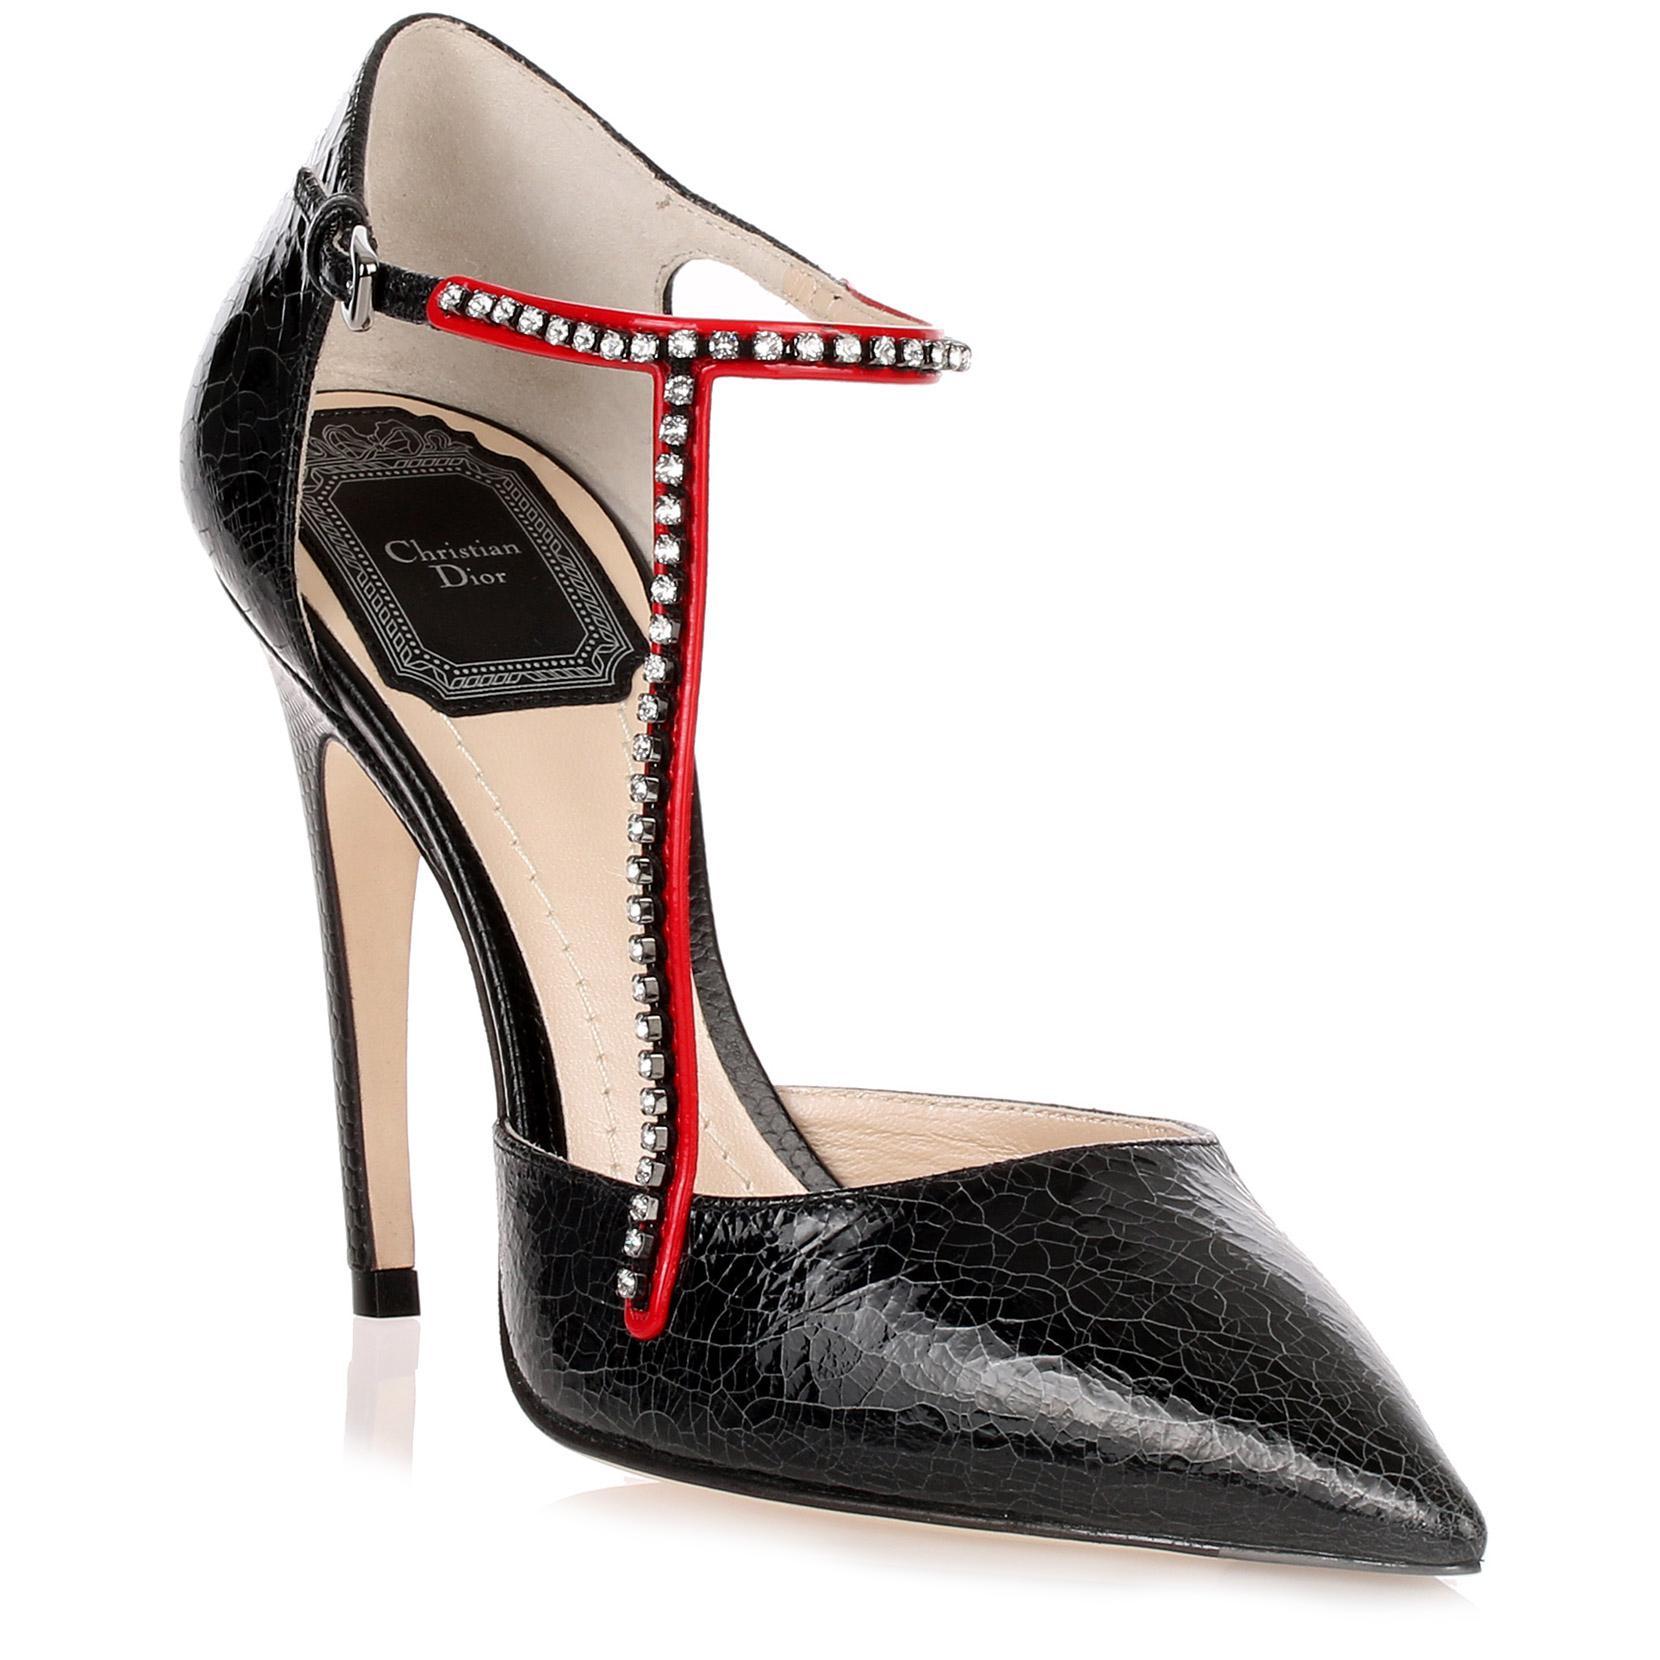 32dd49c8aad7 Dior T-strass Black Crackled Pump in Black - Lyst